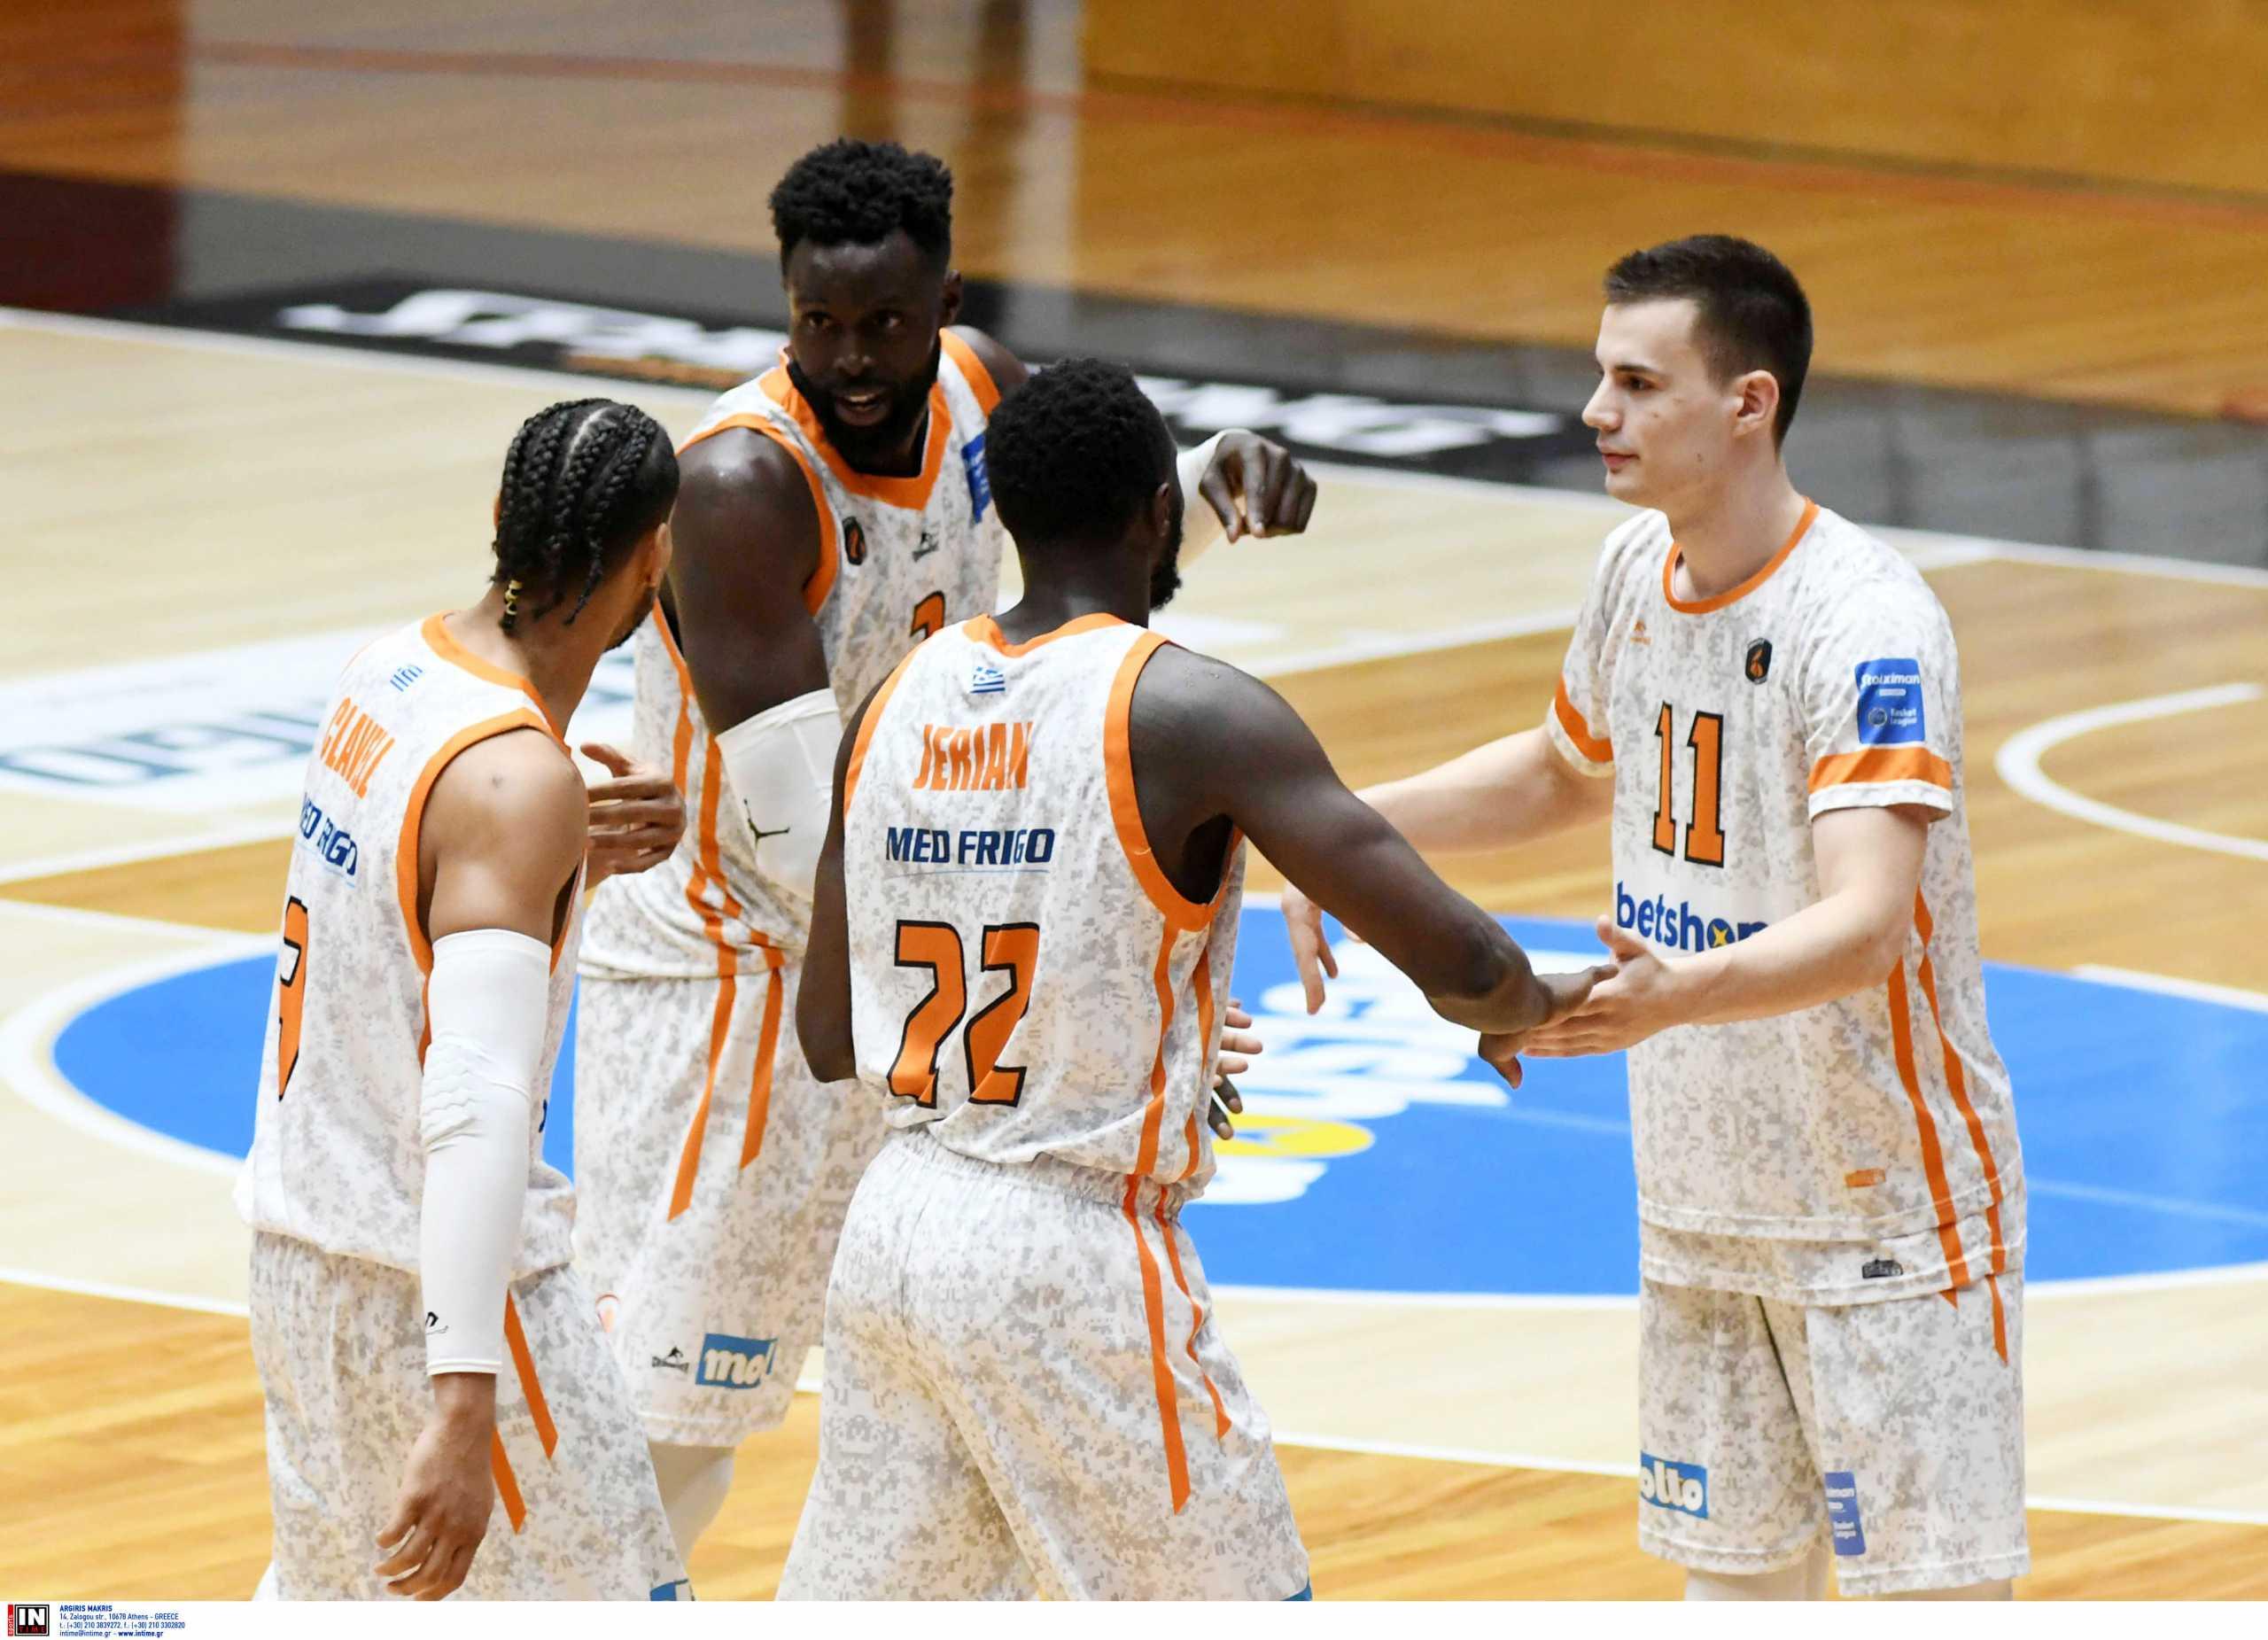 Basket League: Ο Προμηθέας «διέλυσε» το Περιστέρι και προκρίθηκε στα ημιτελικά